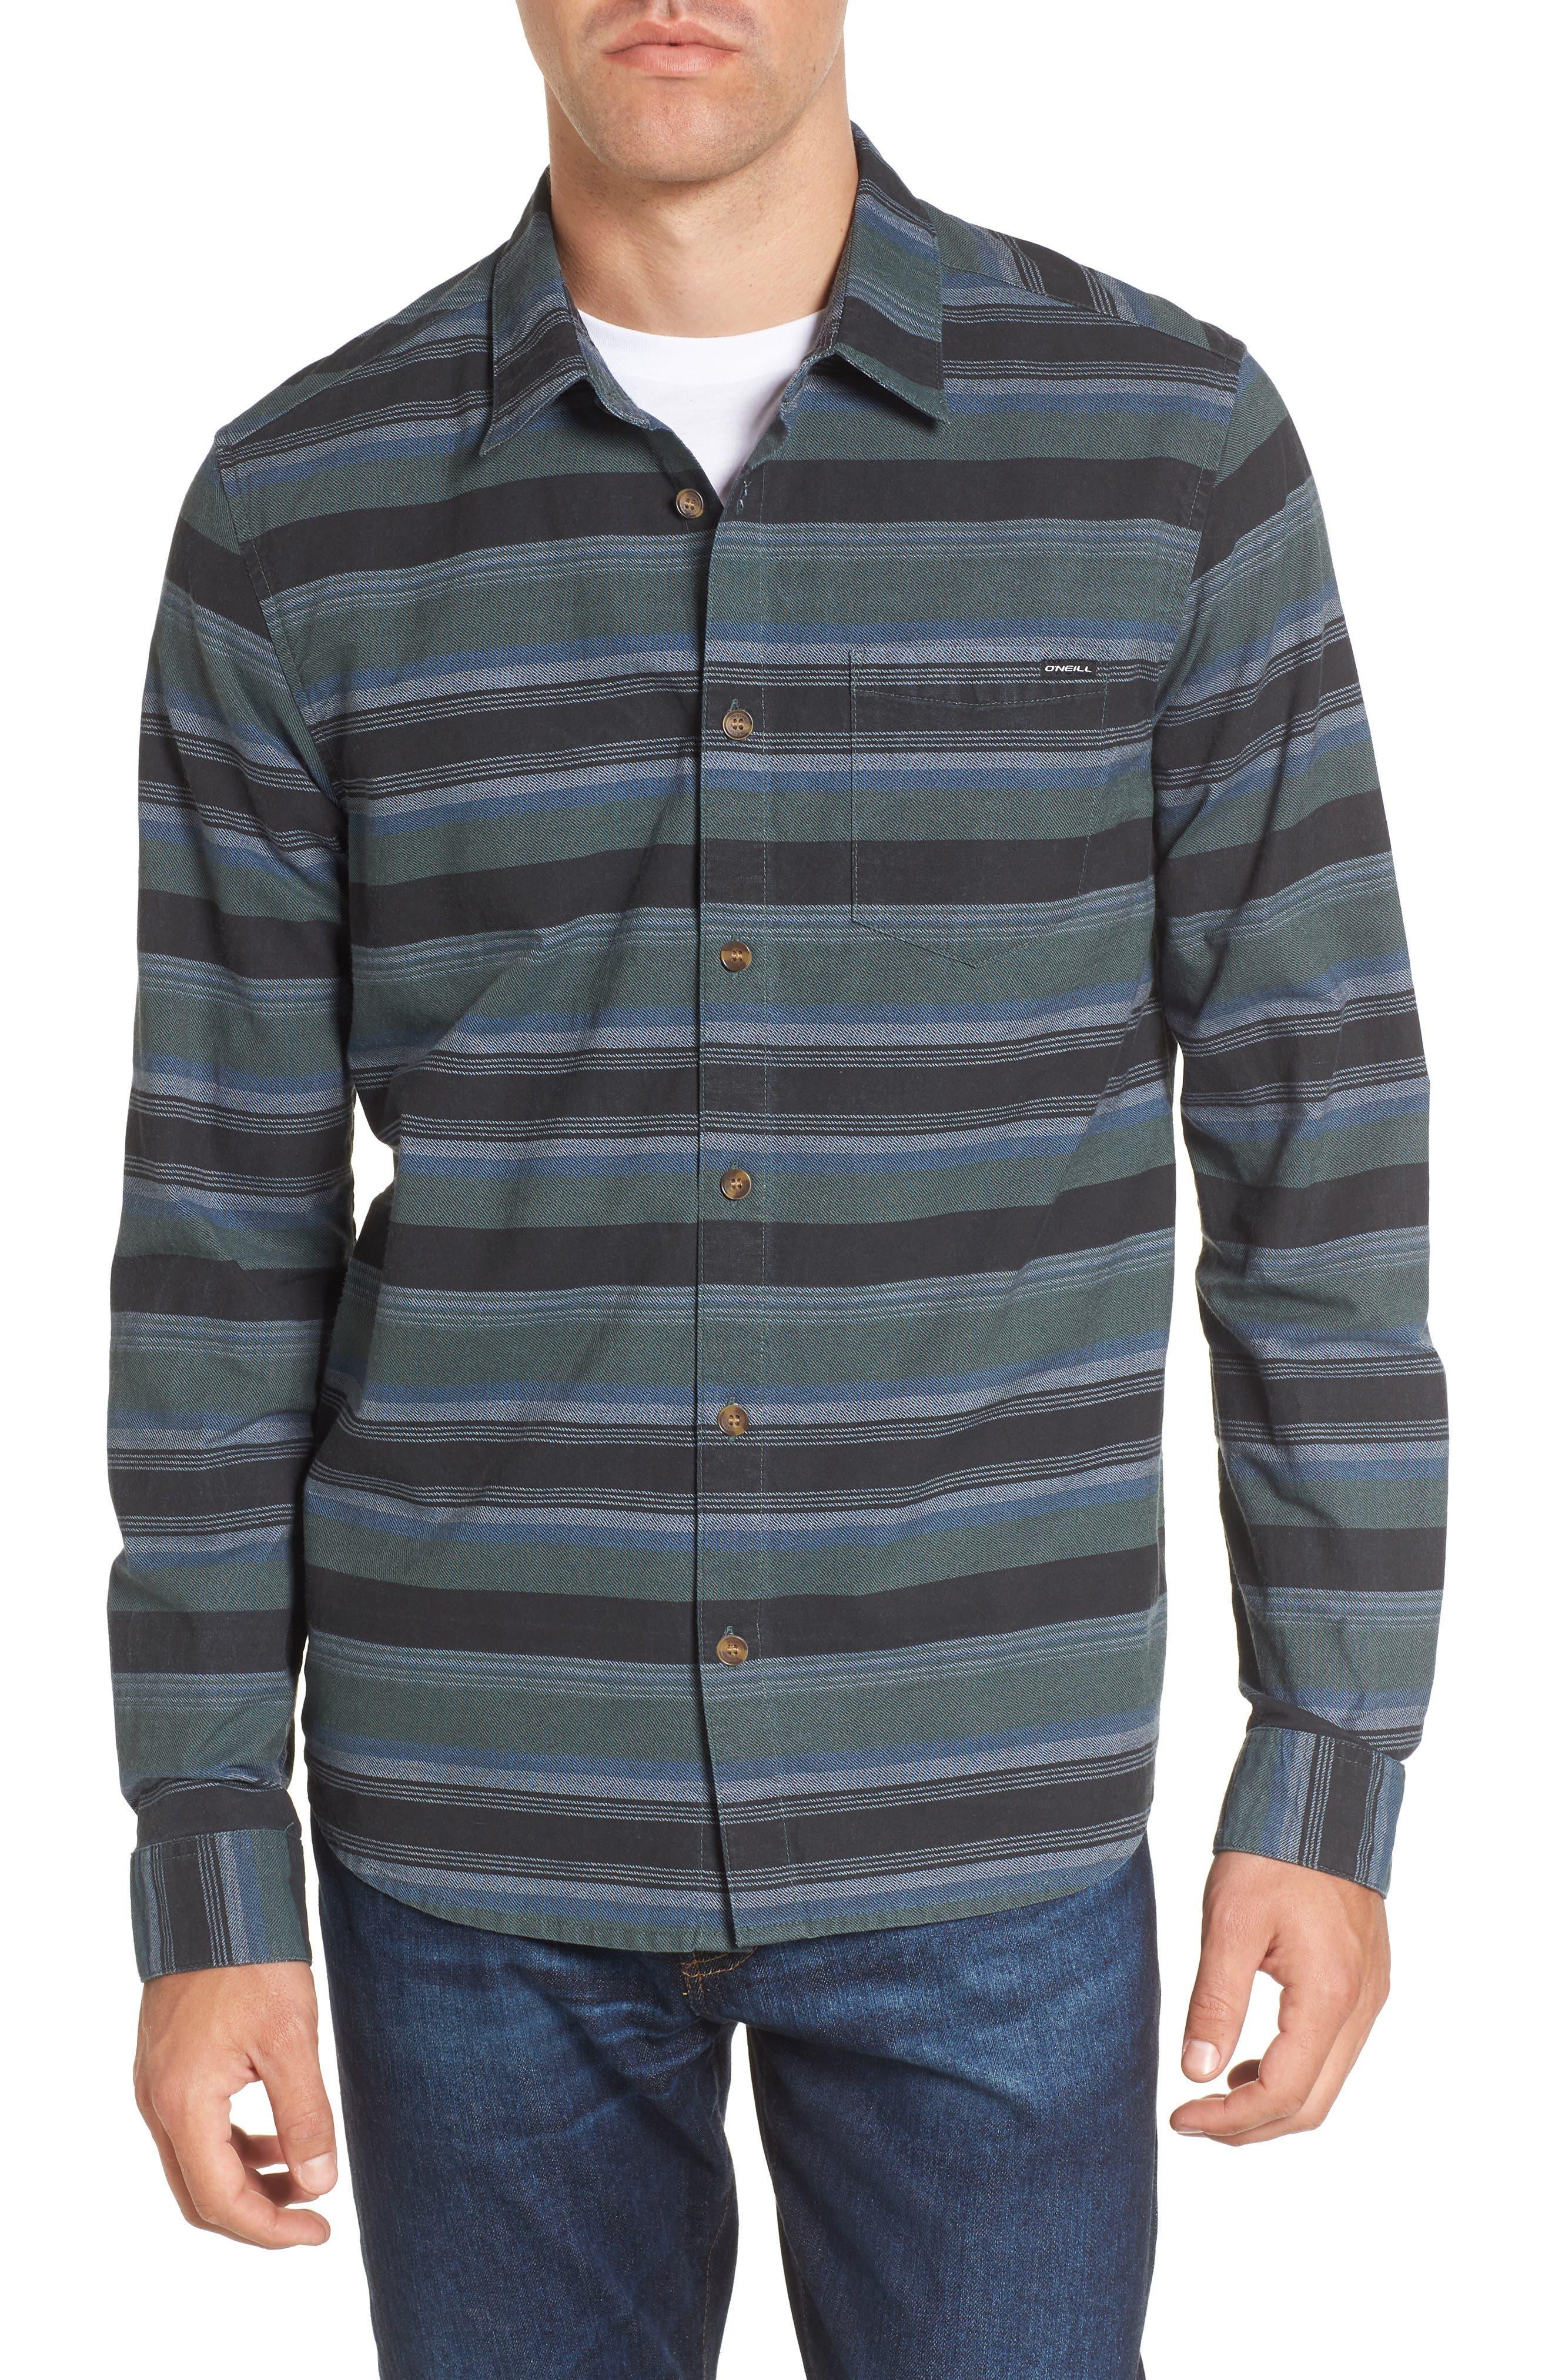 O'Neill Barton Stripe Woven Shirt